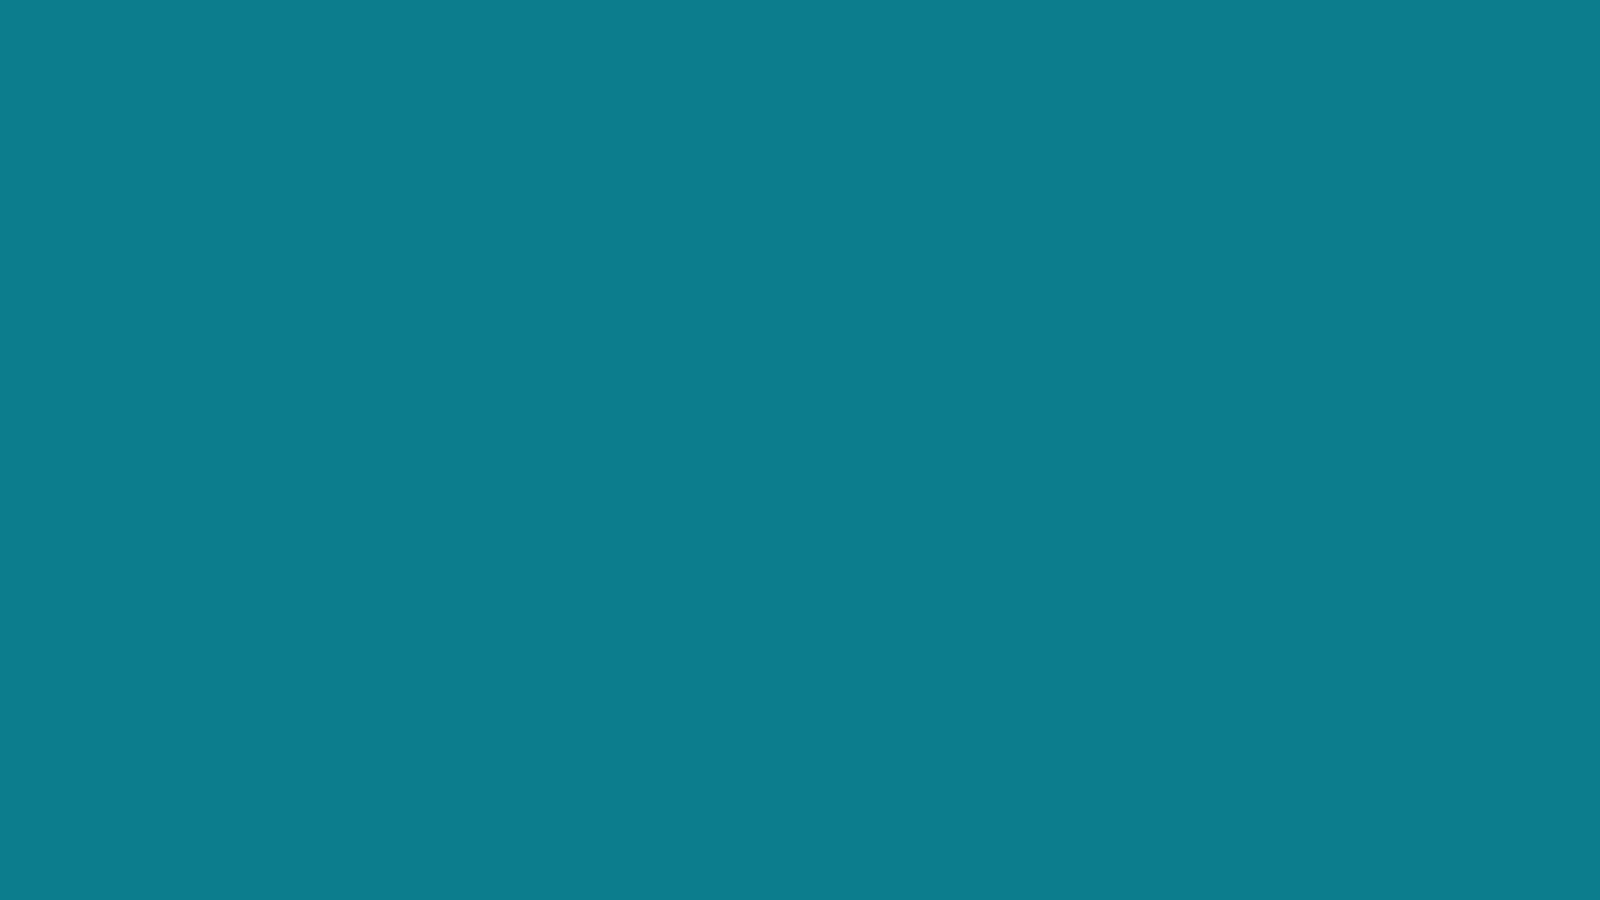 1600x900 Metallic Seaweed Solid Color Background